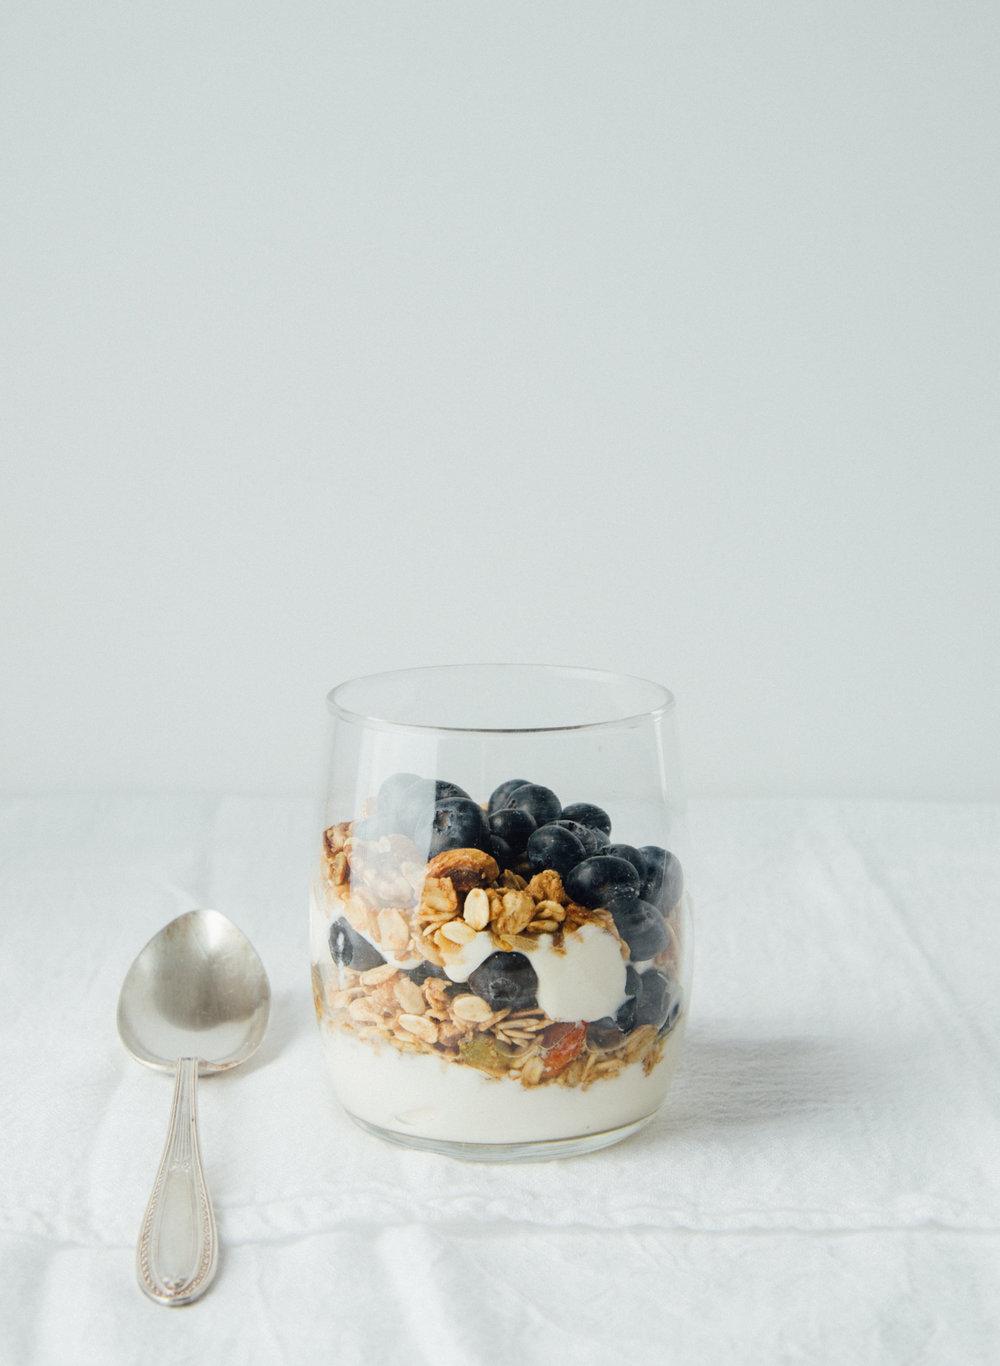 Yogurt, berries and handmade  Go Nuts Granola  from  True North  /Photo:  Melissa DiPalma